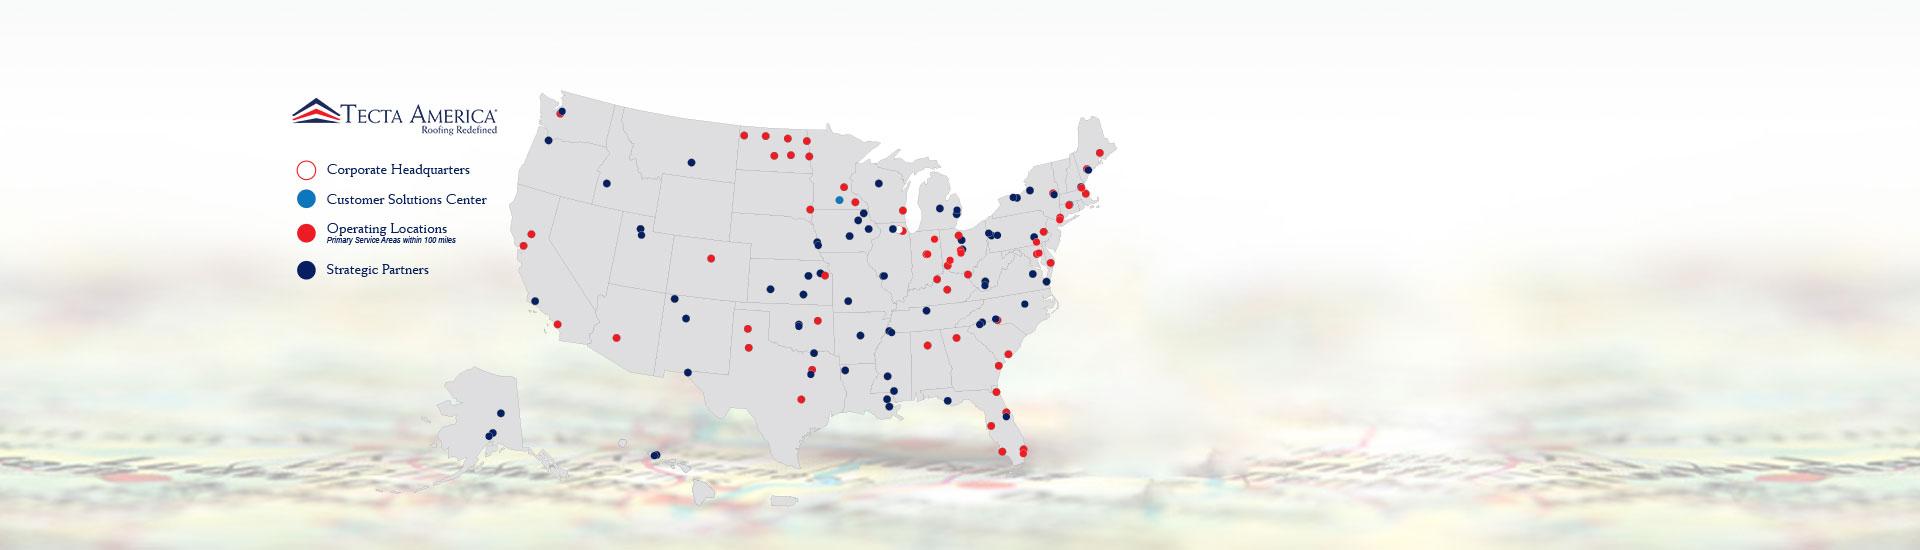 Tecta America Locations Banner 06-21-18